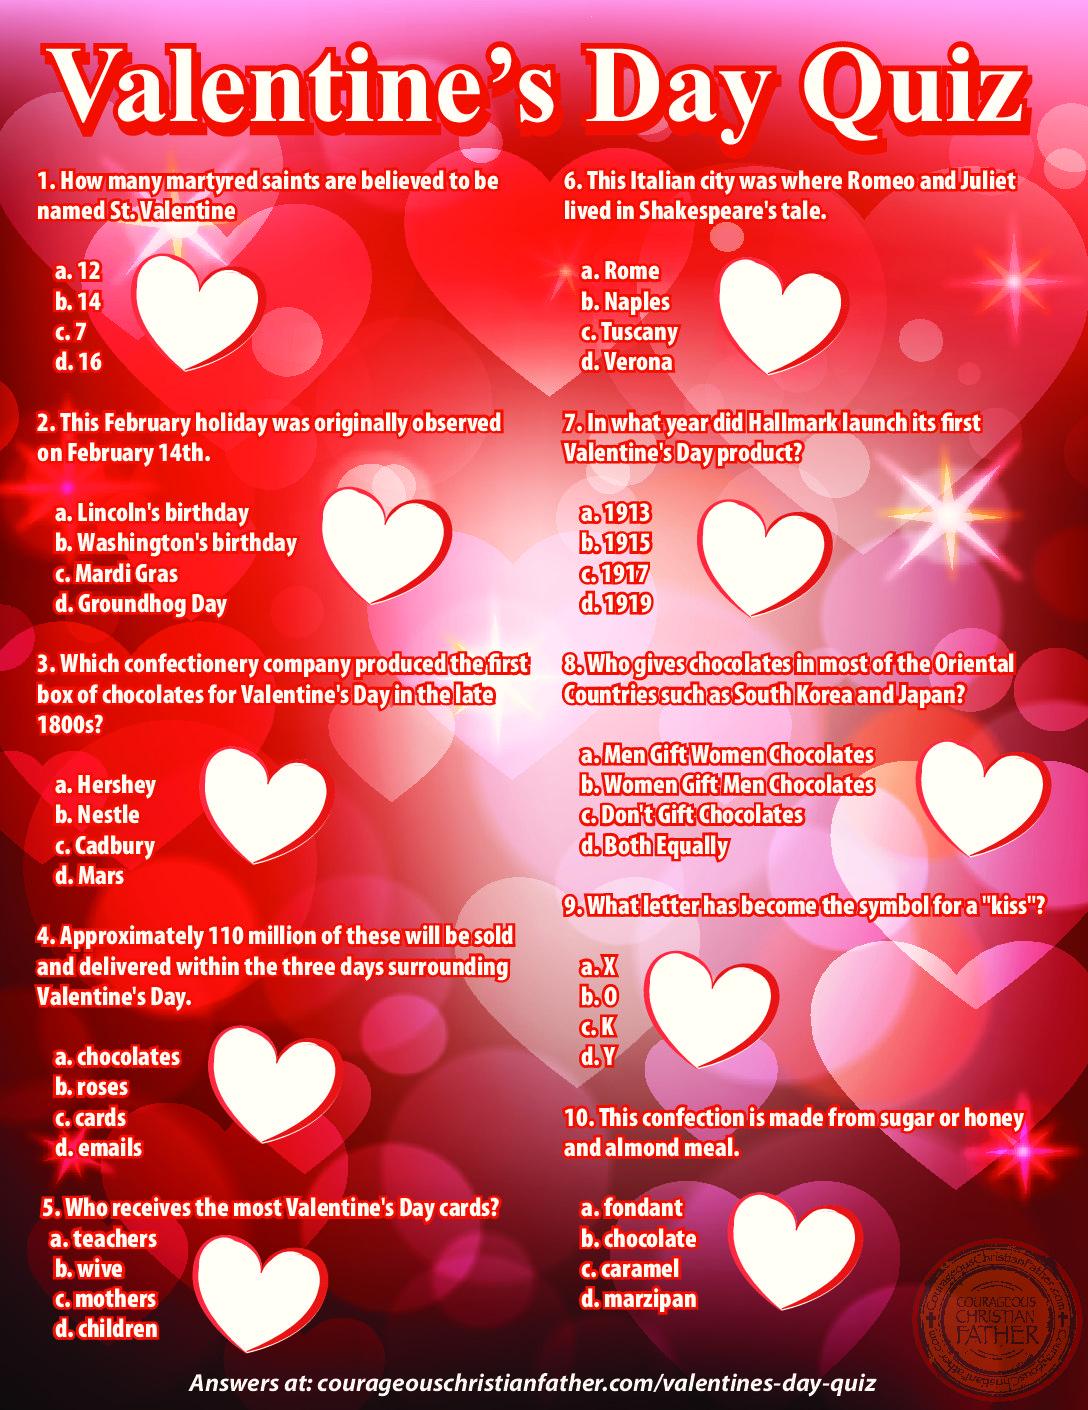 graphic regarding Mardi Gras Trivia Quiz Printable identify Valentines Working day Quiz Brave Christian Dad